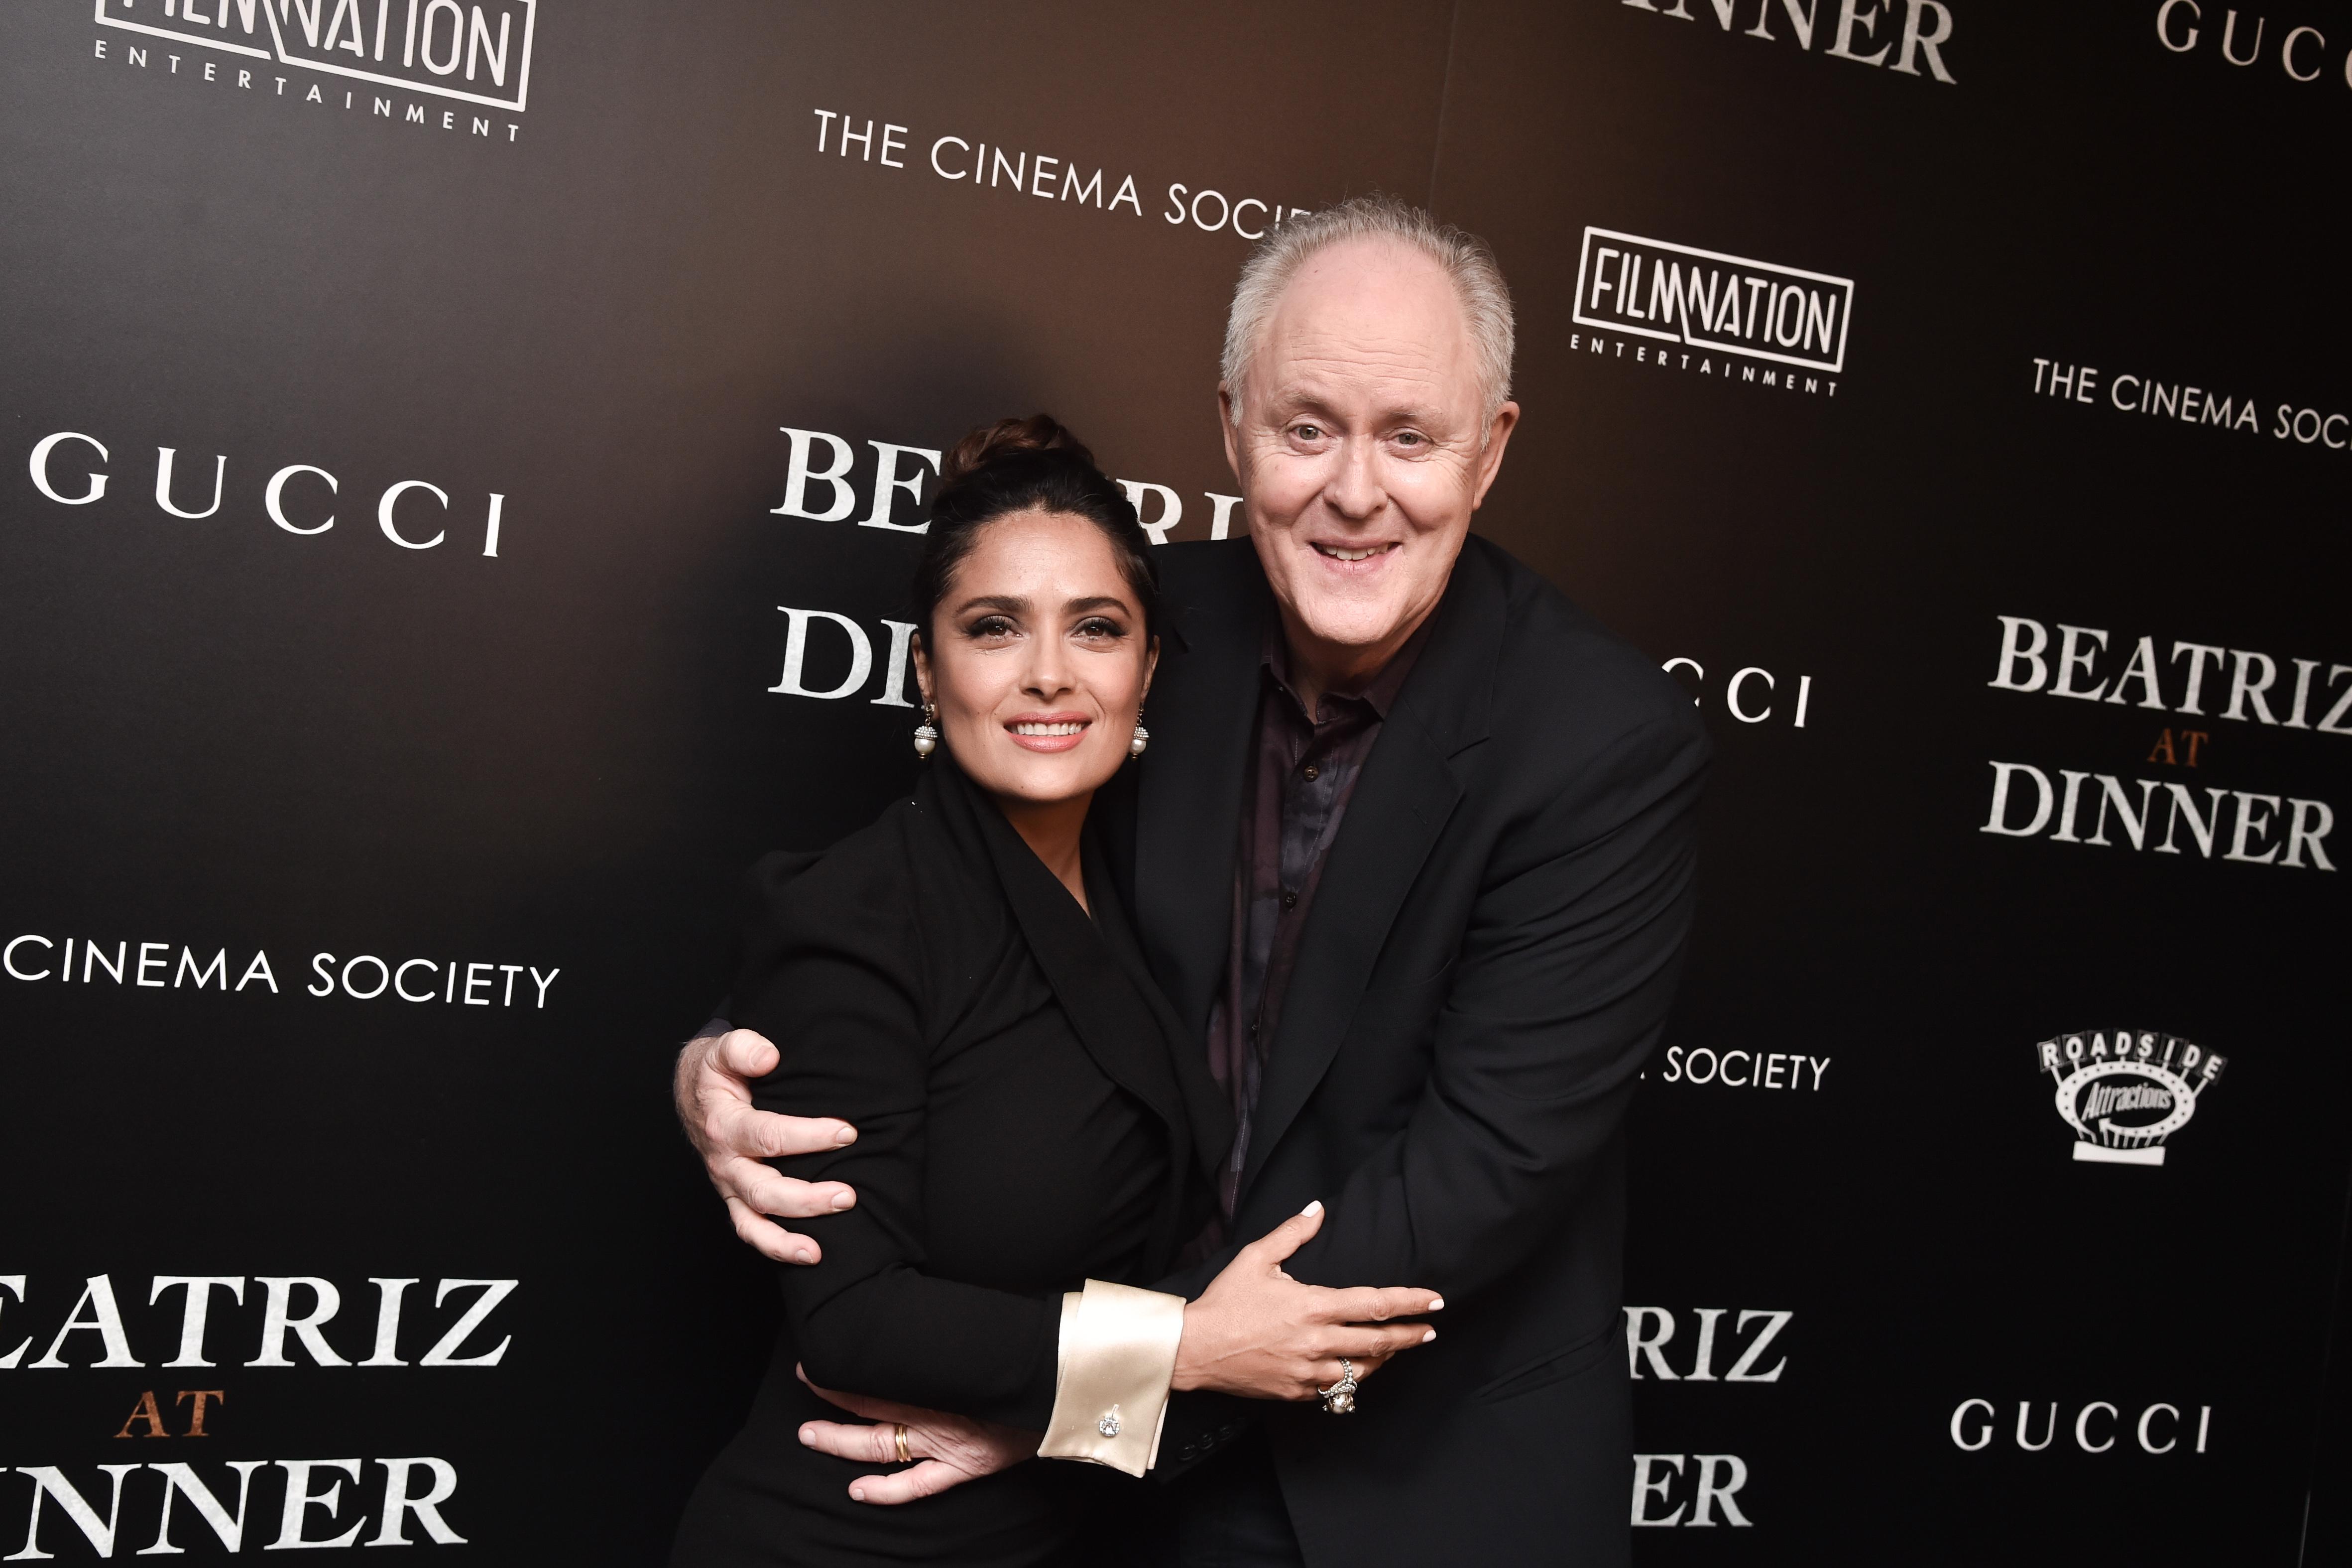 Salma Hayek, John Lithgow'Beatriz at Dinner' film screening, New York, USA - 06 Jun 2017